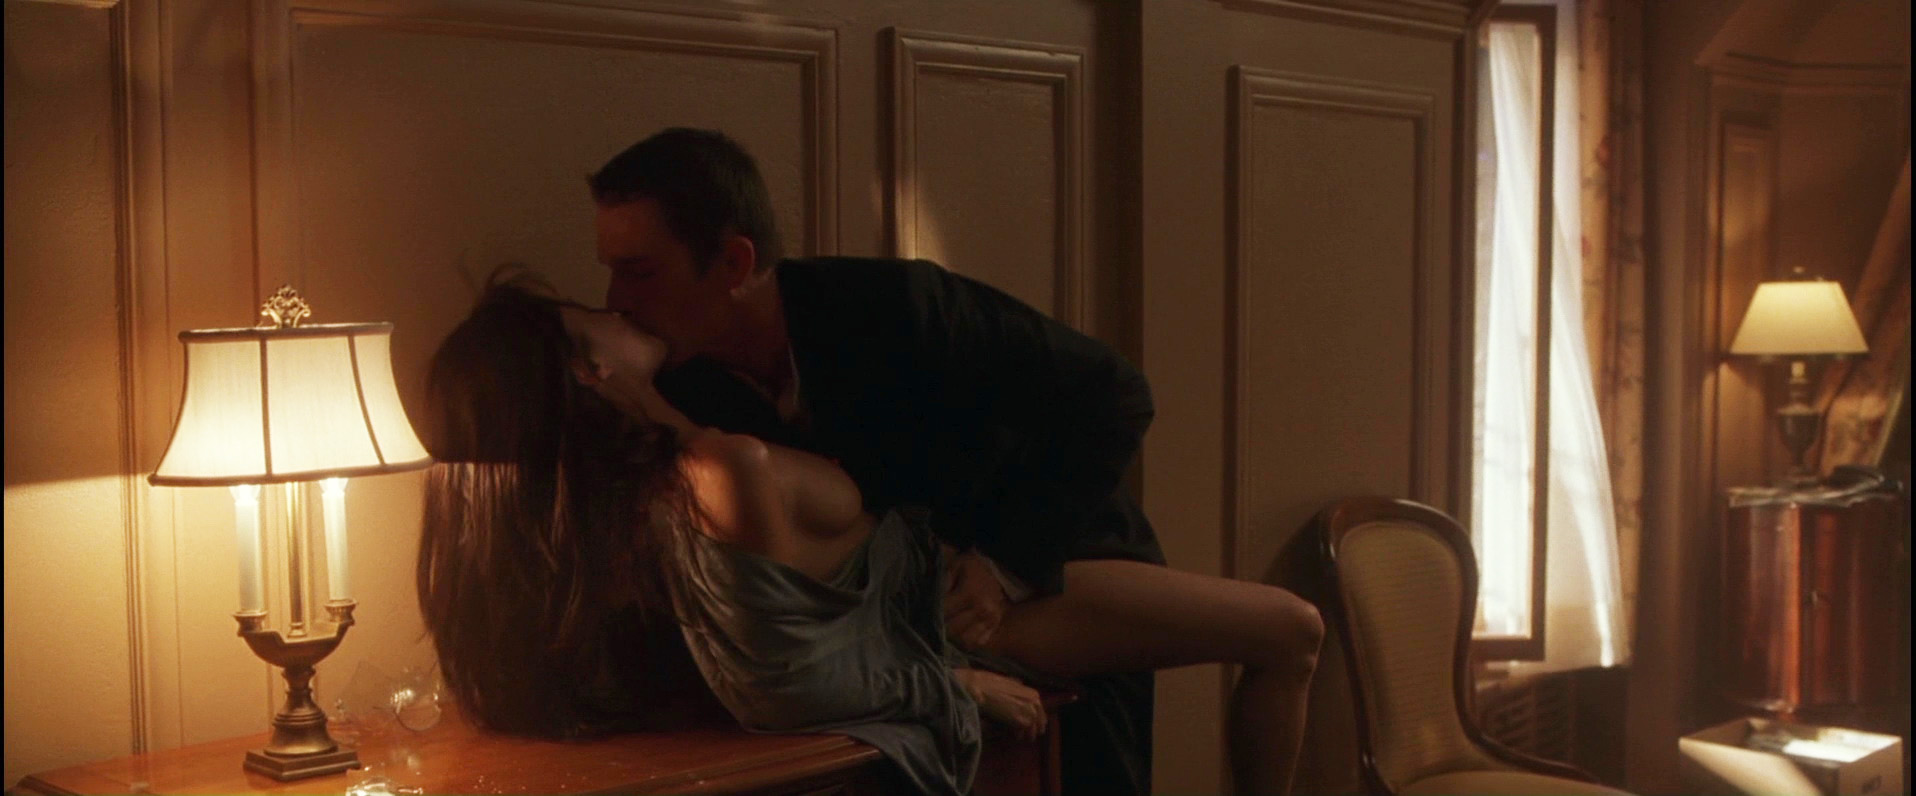 Angelina Jolie Sin Sex Scene watch online - angelina jolie – taking lives (2004) hd 1080p